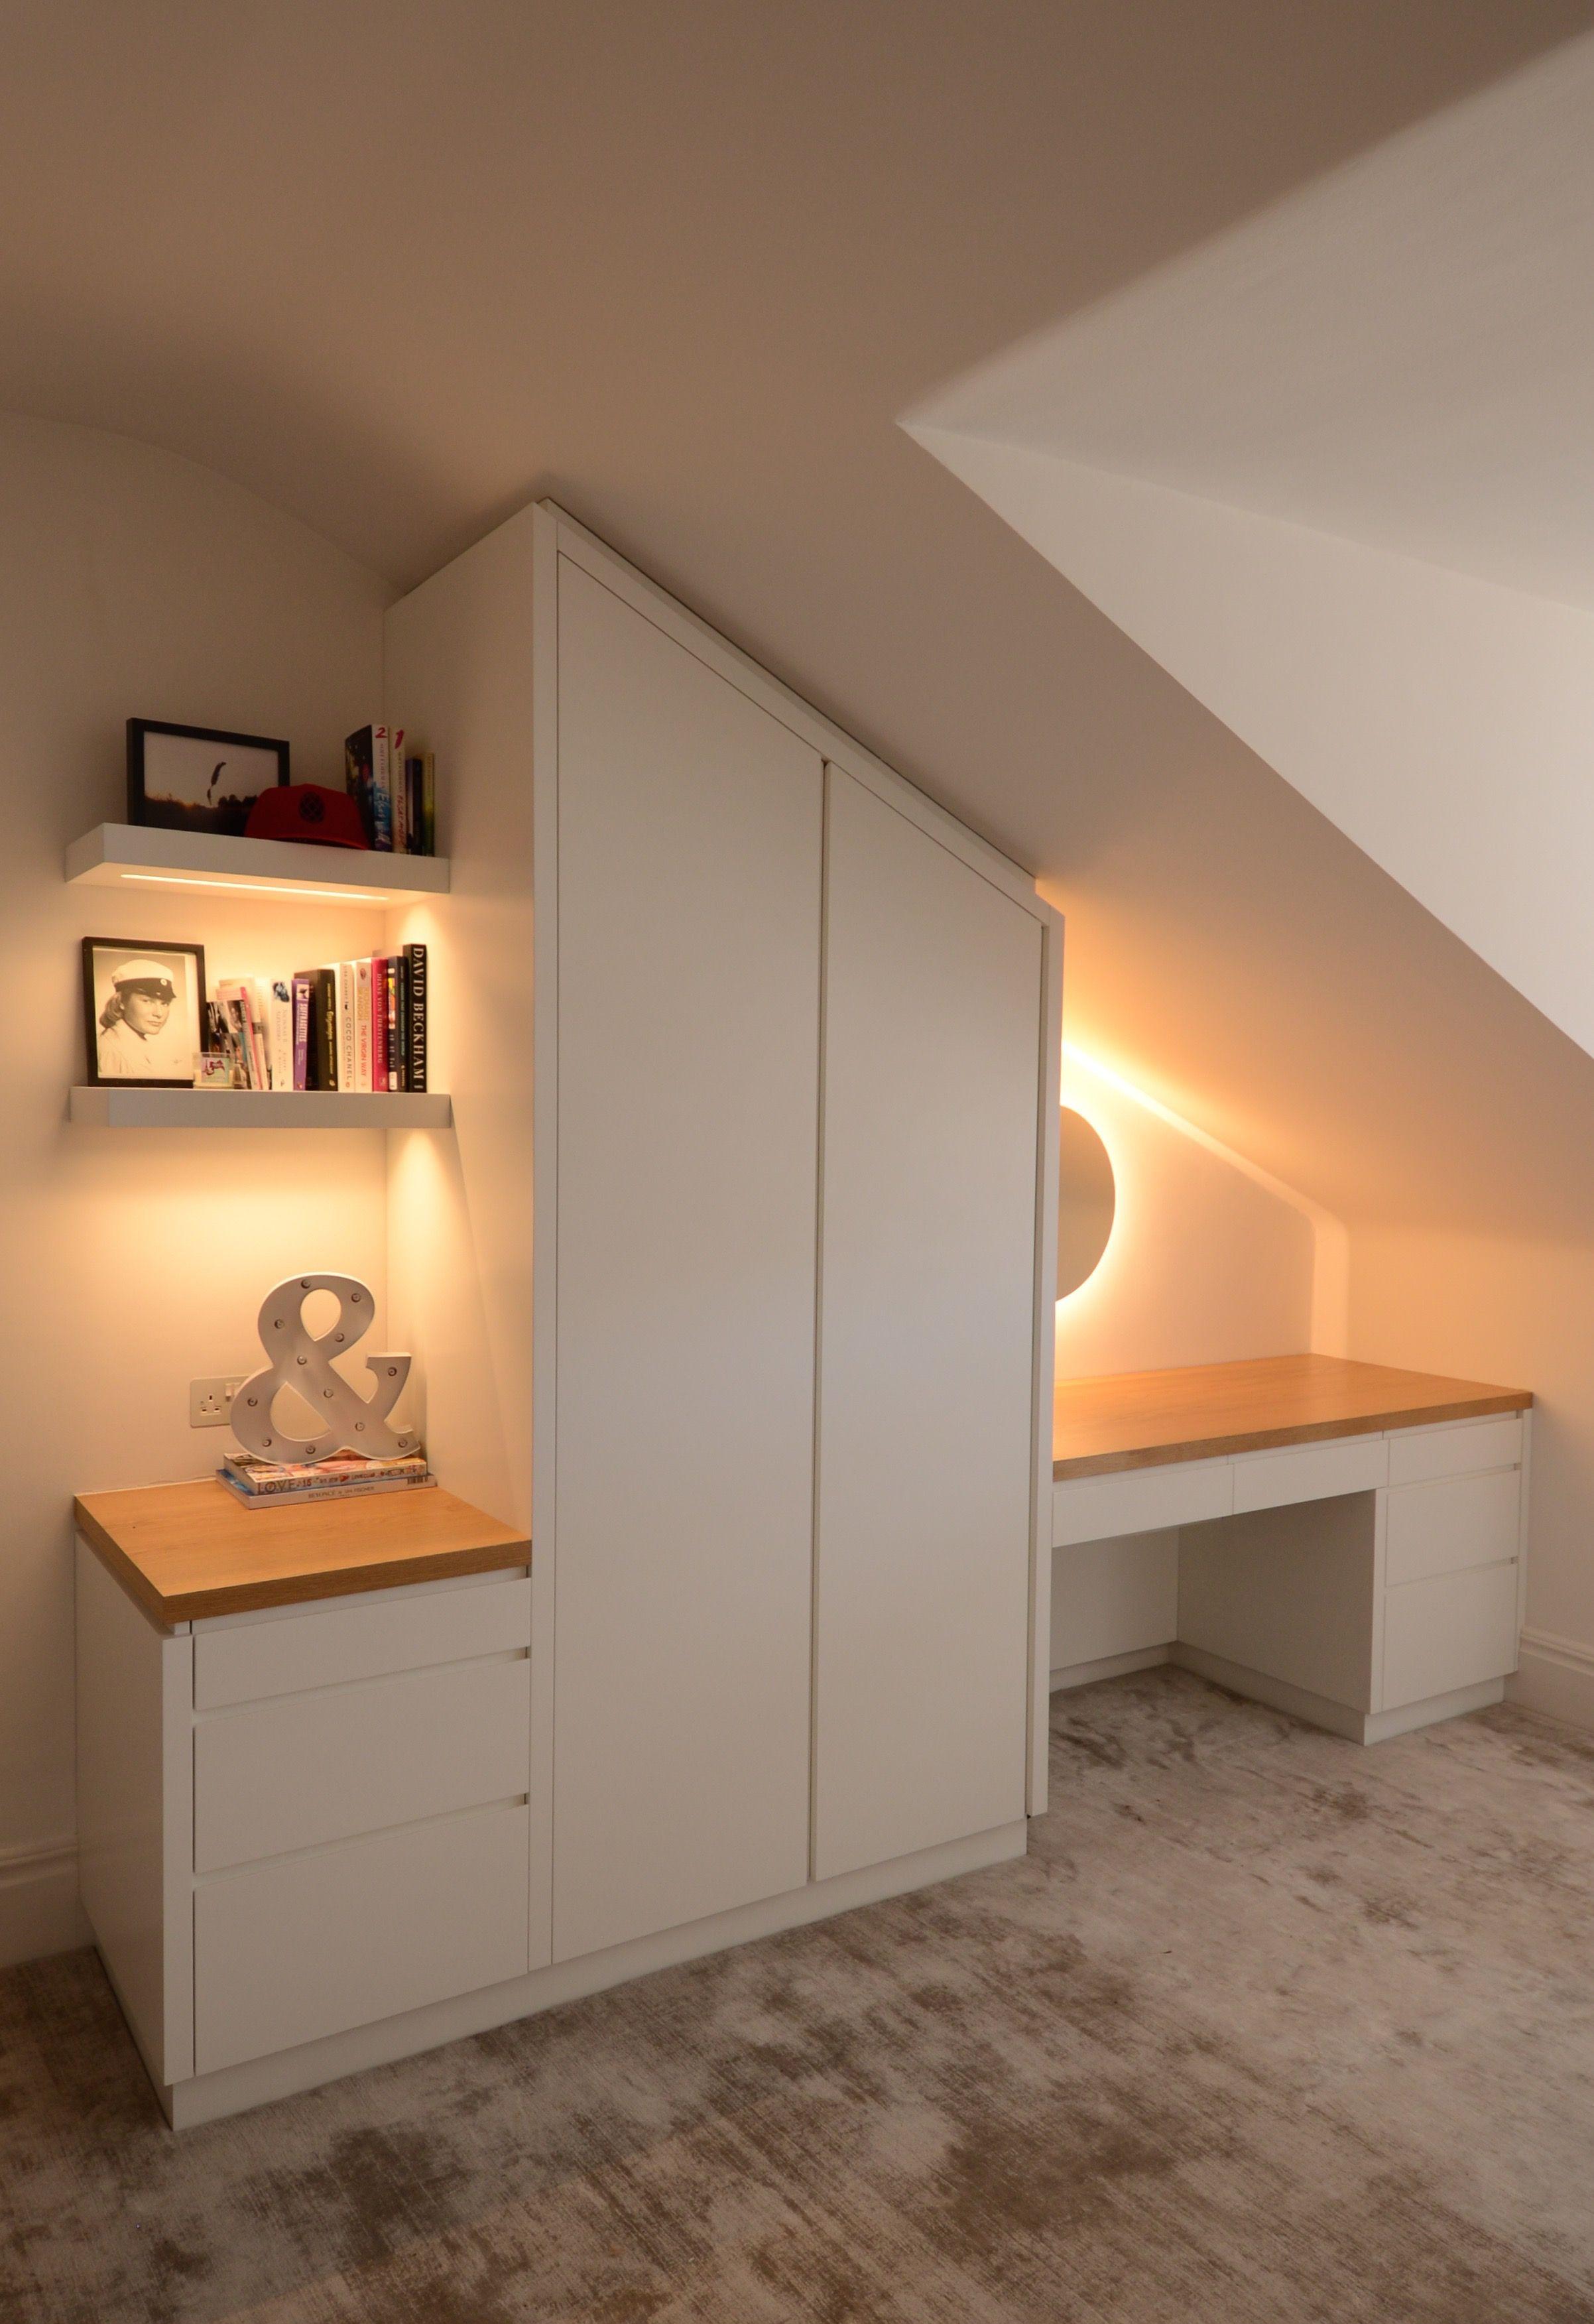 Maxwell Pinborough Bespoke Furniture Design London